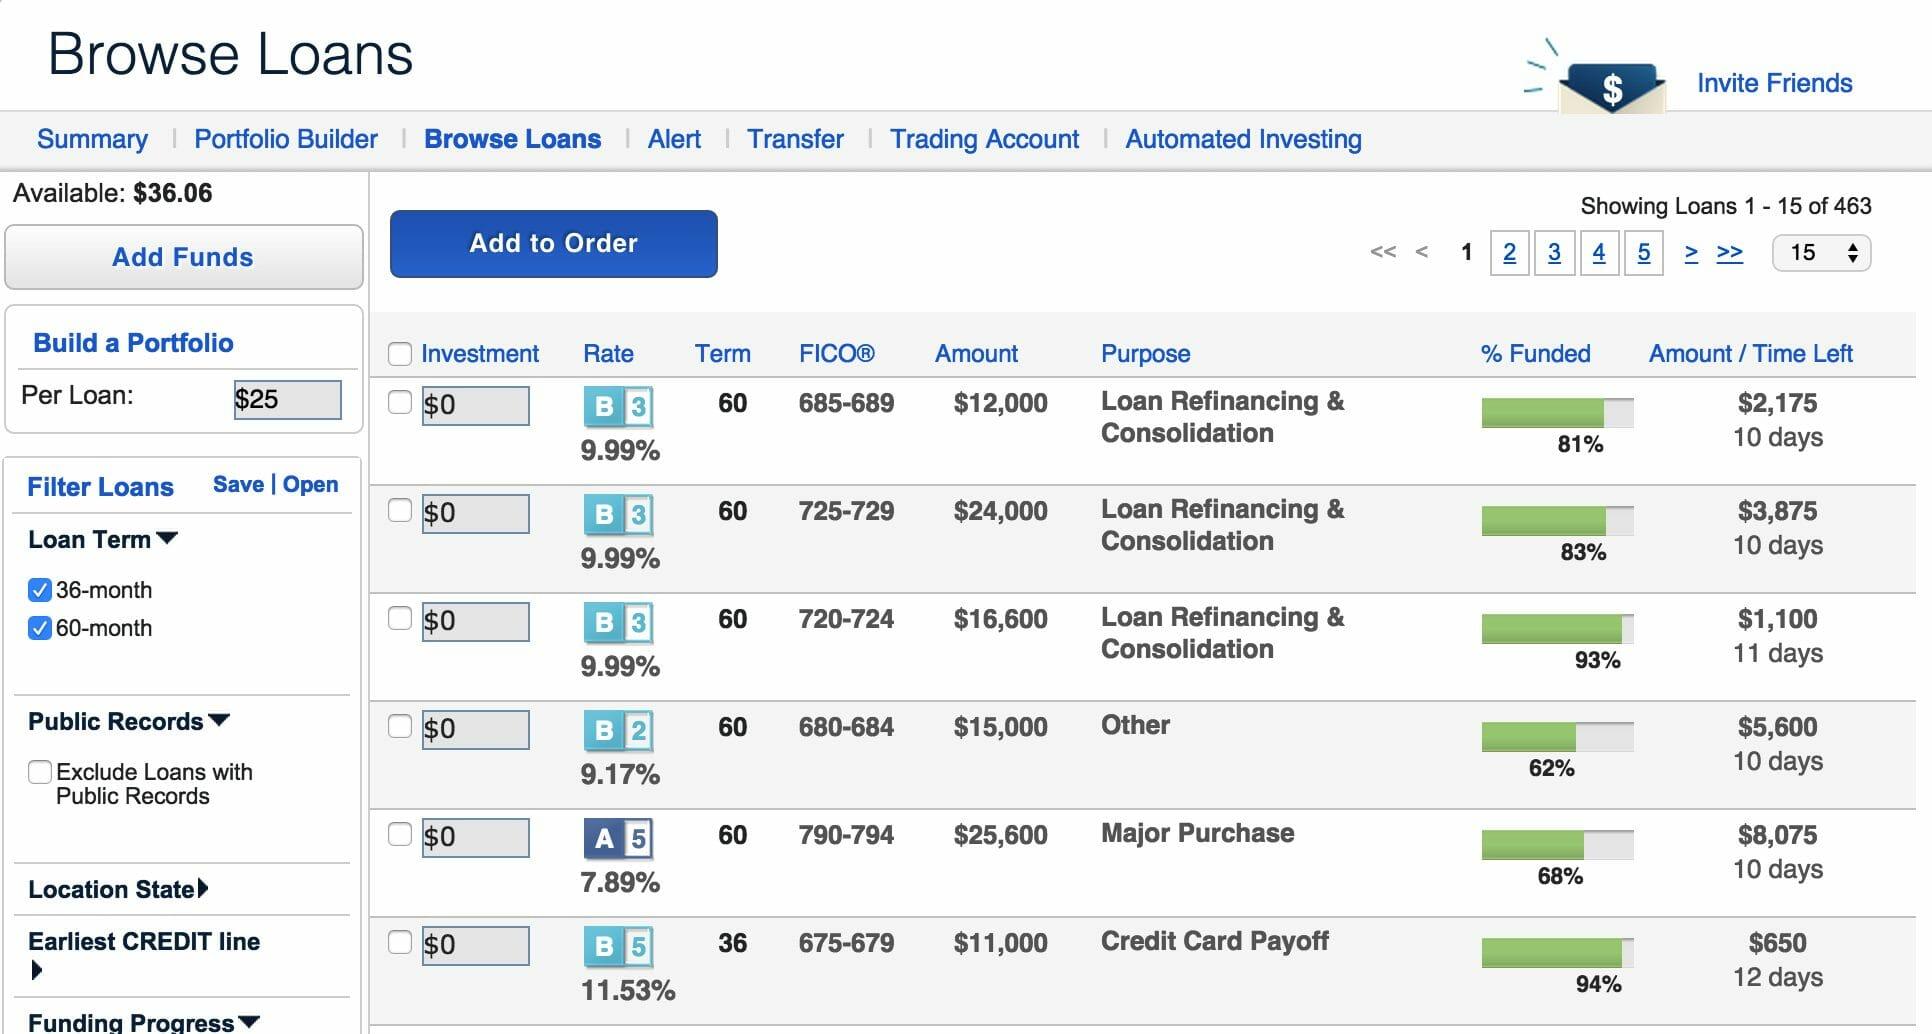 lending-club-browse-loans